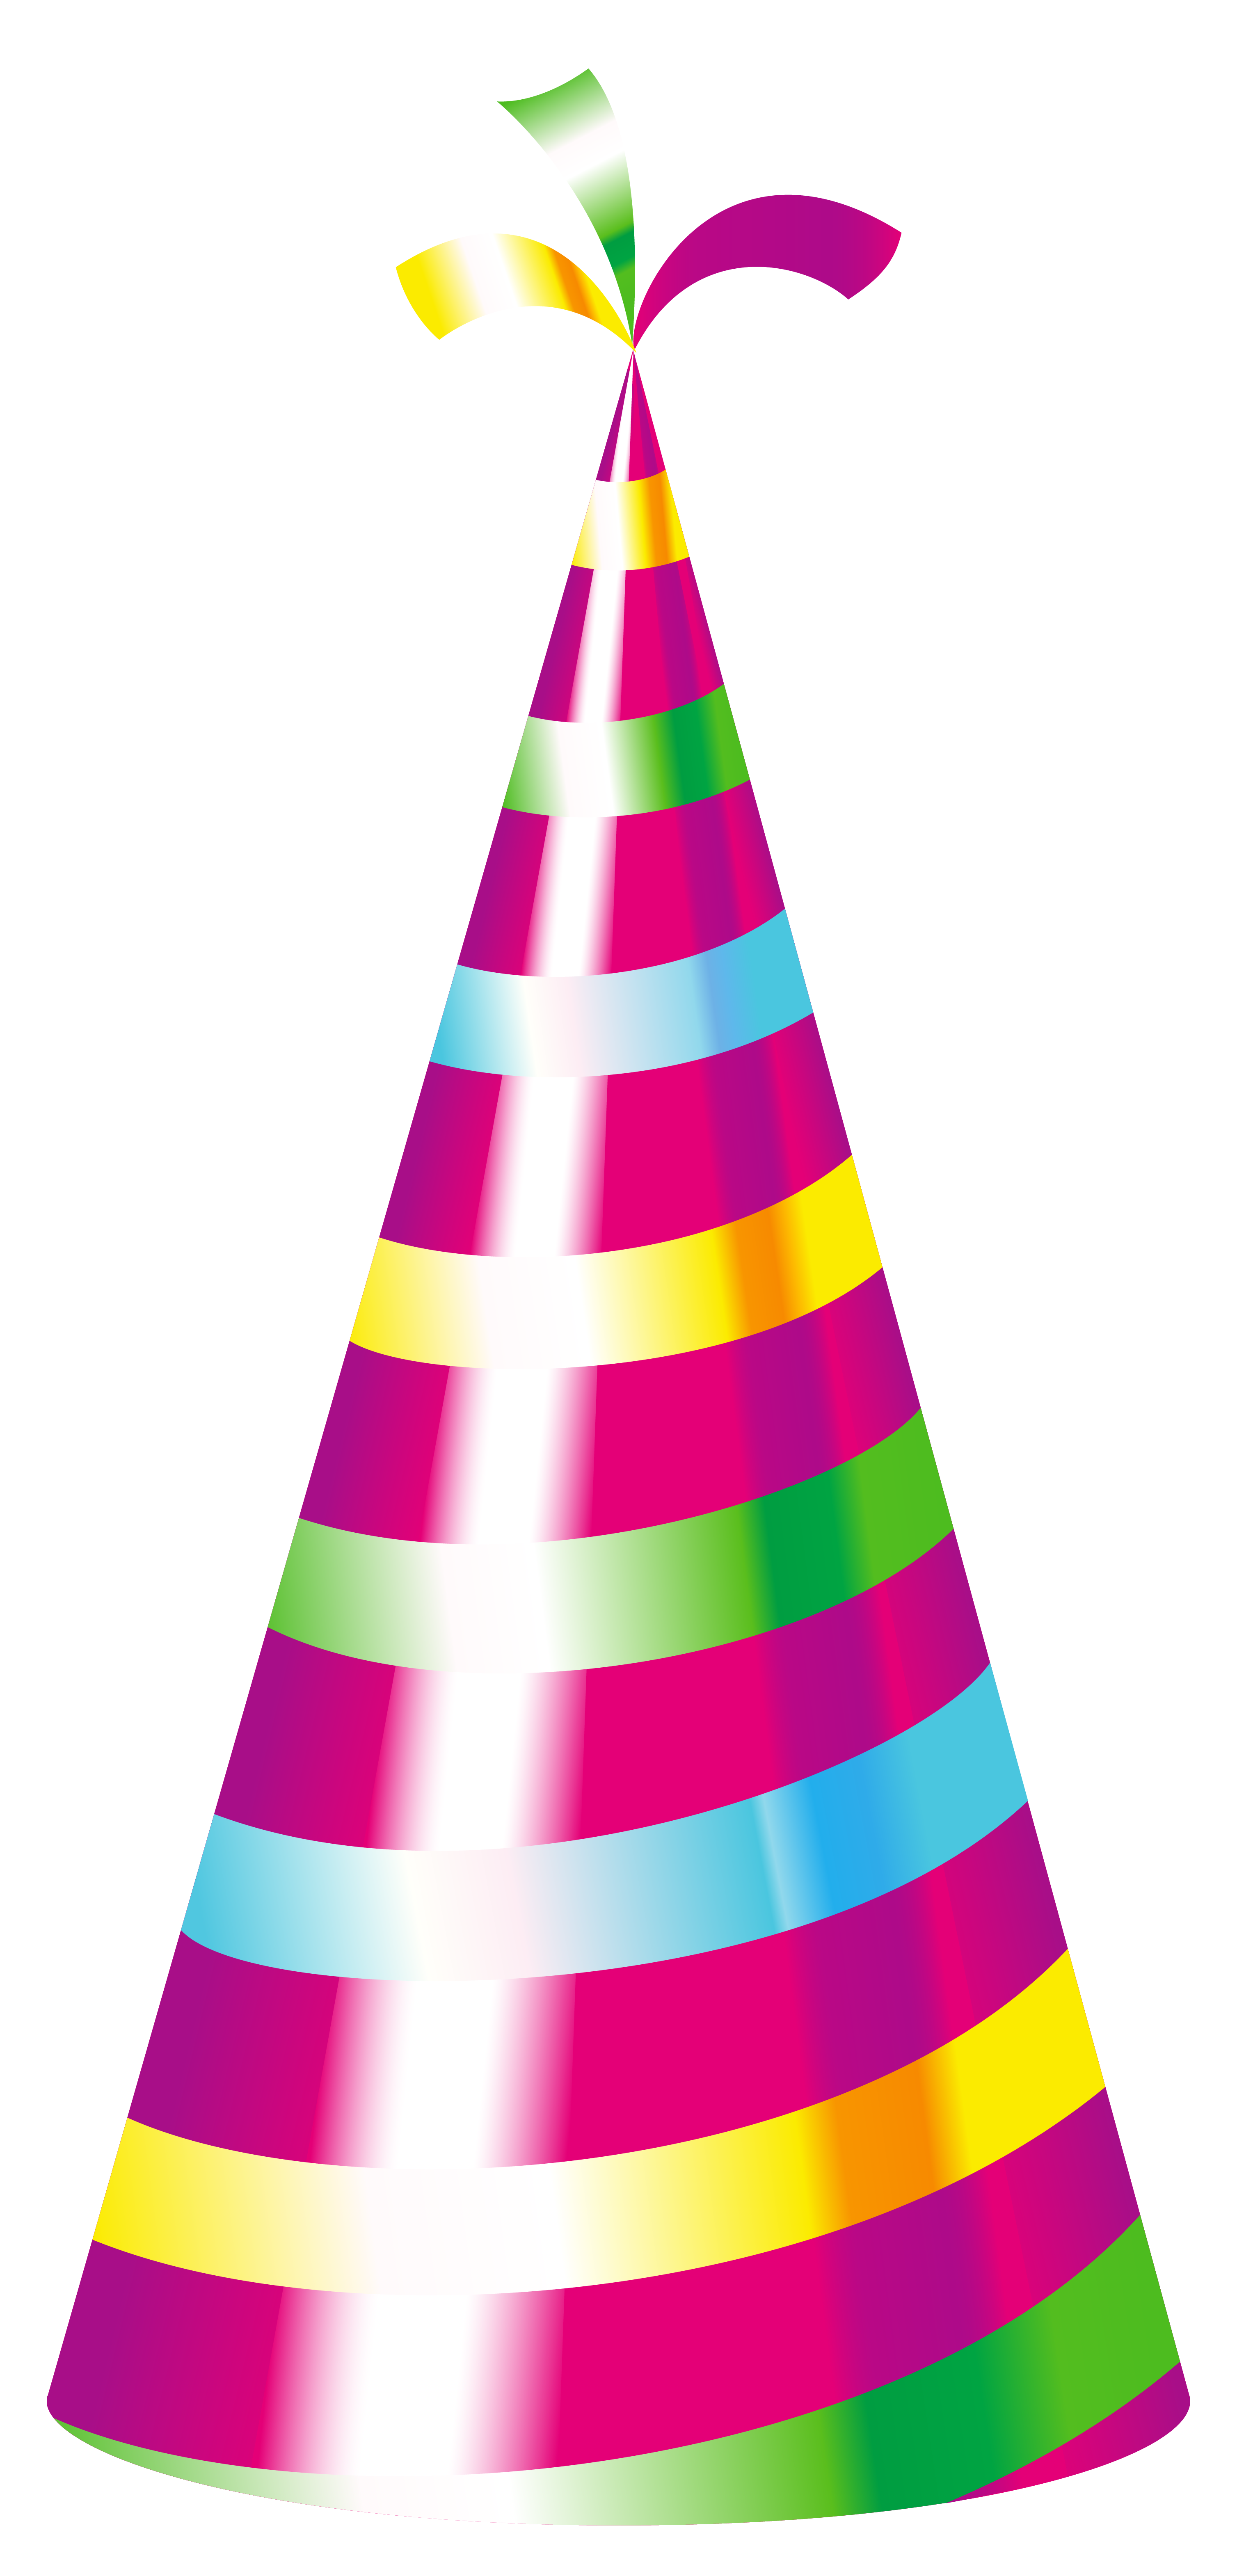 3015x6279 Party Hat Clipart Transparent Background